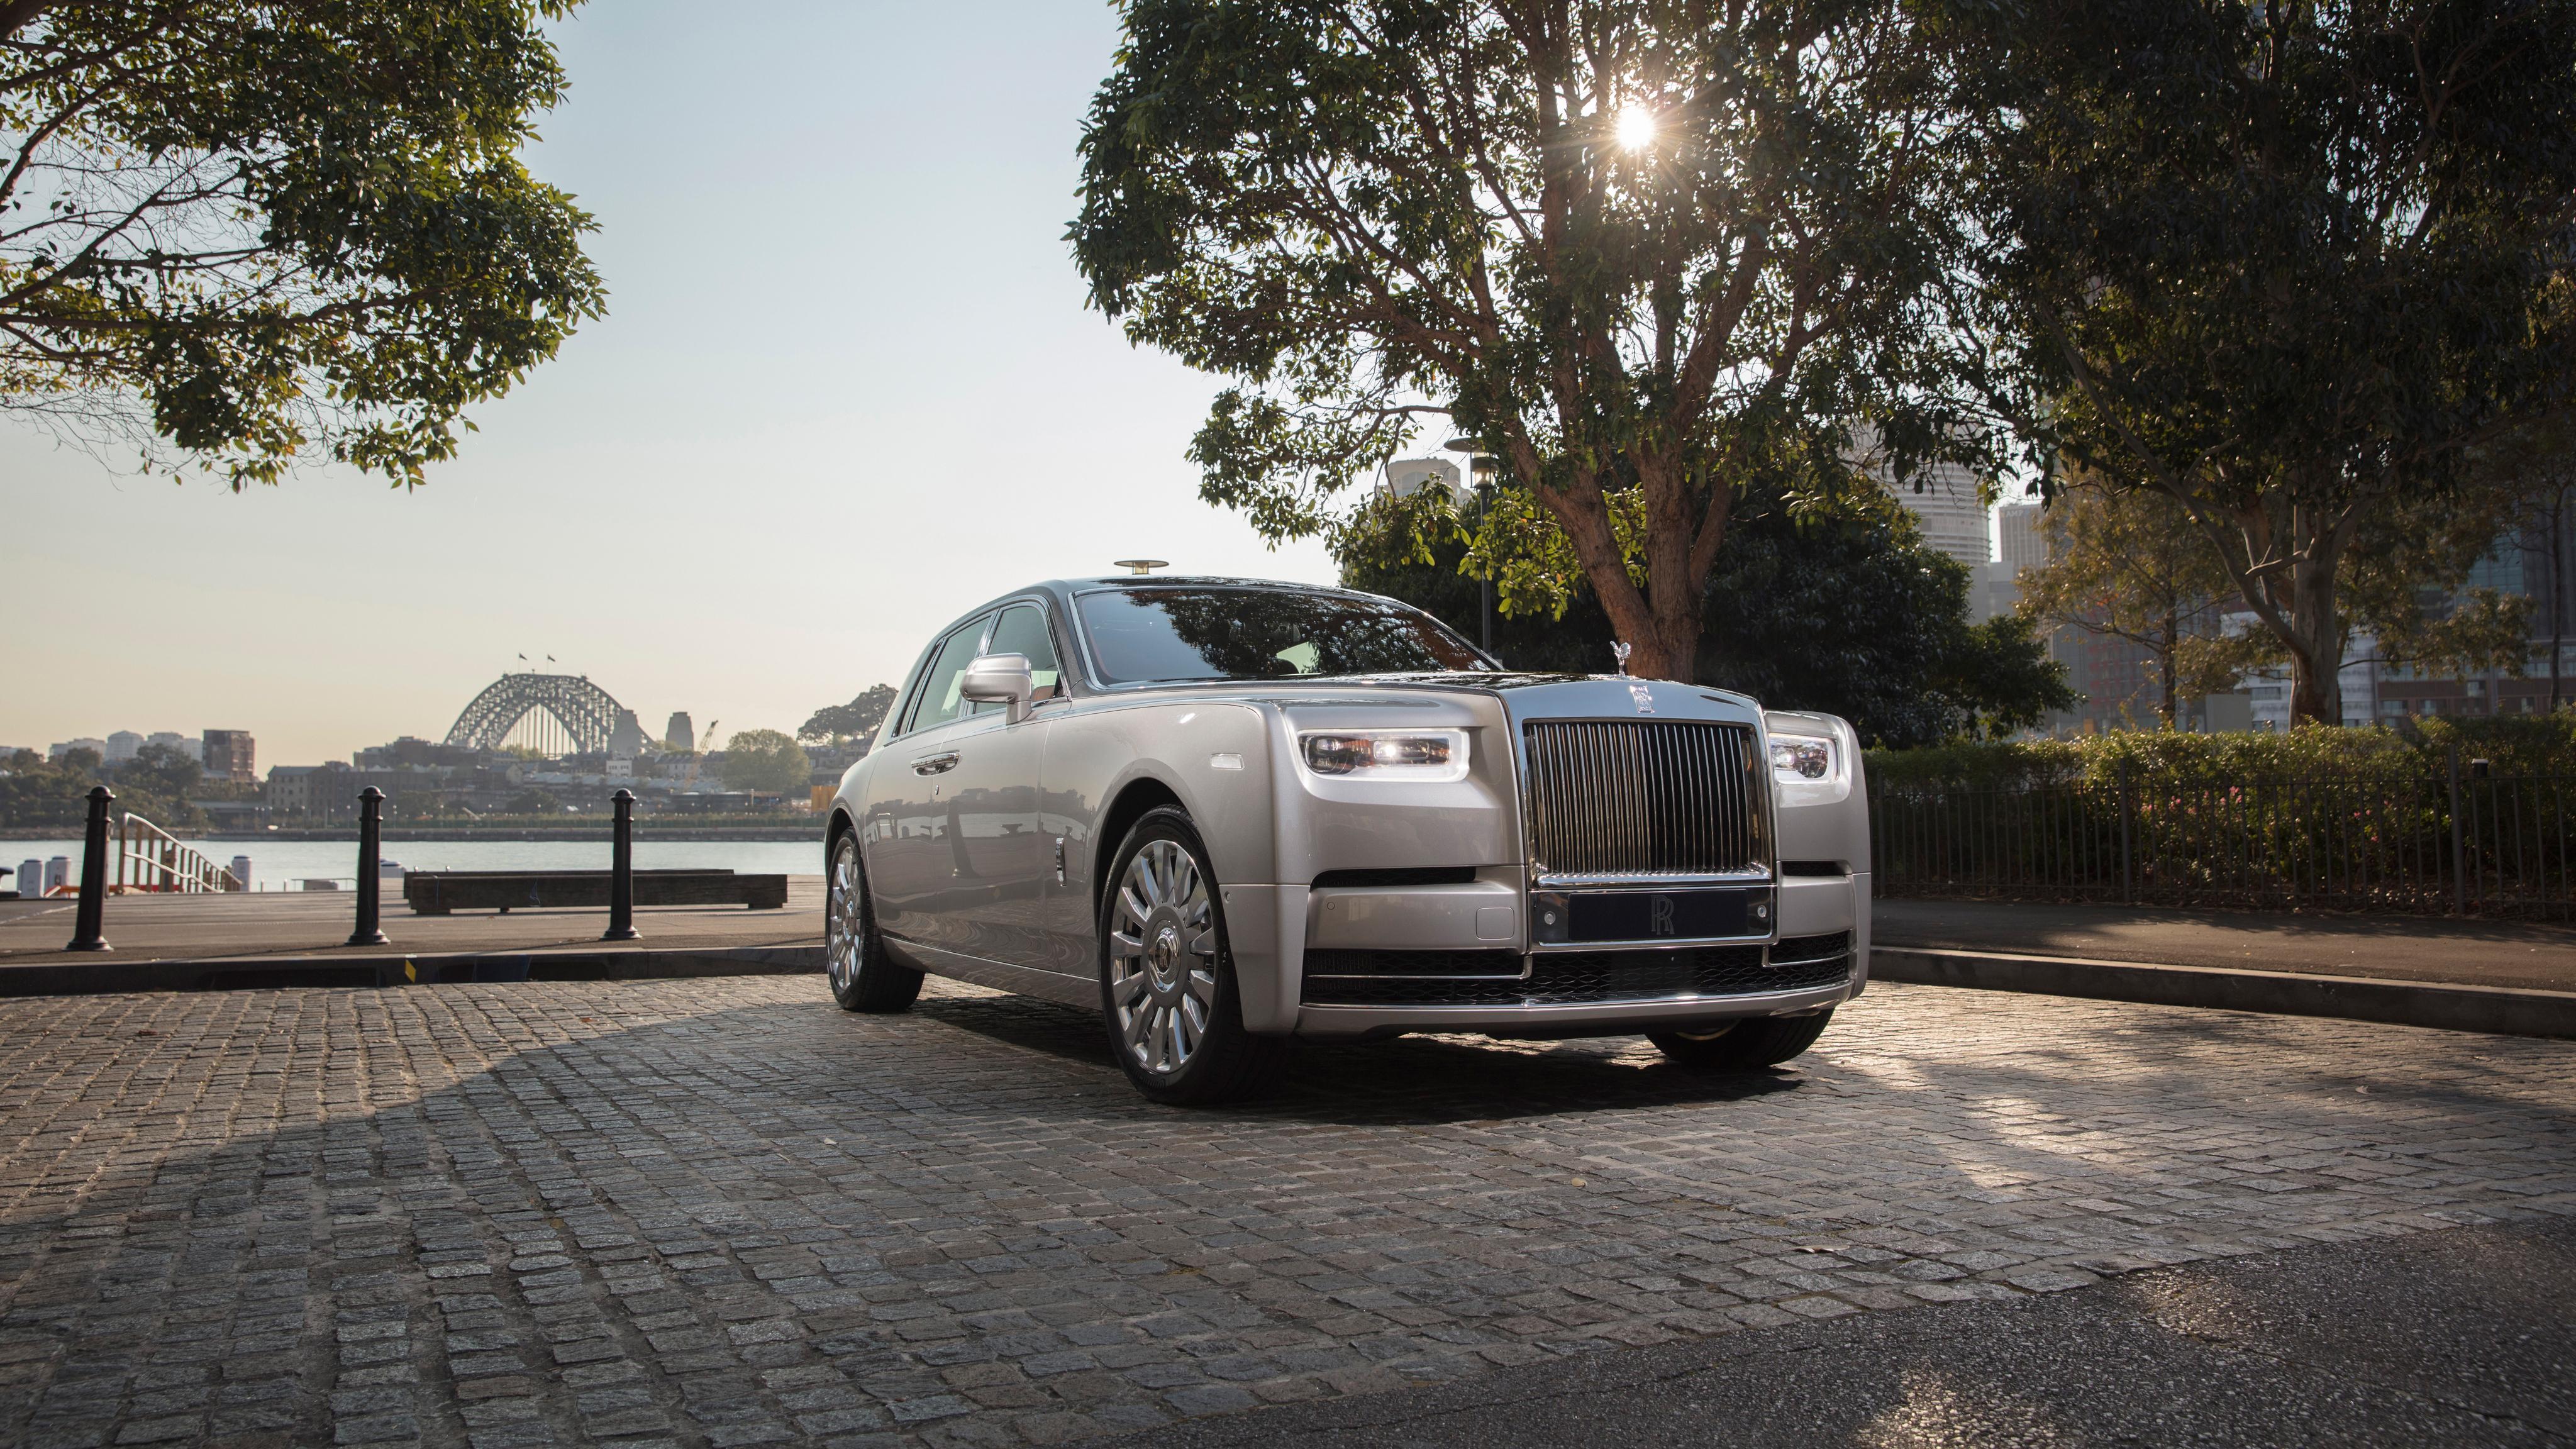 2018 Rolls Royce Phantom 4k 2 Wallpaper Hd Car Wallpapers Id 8756